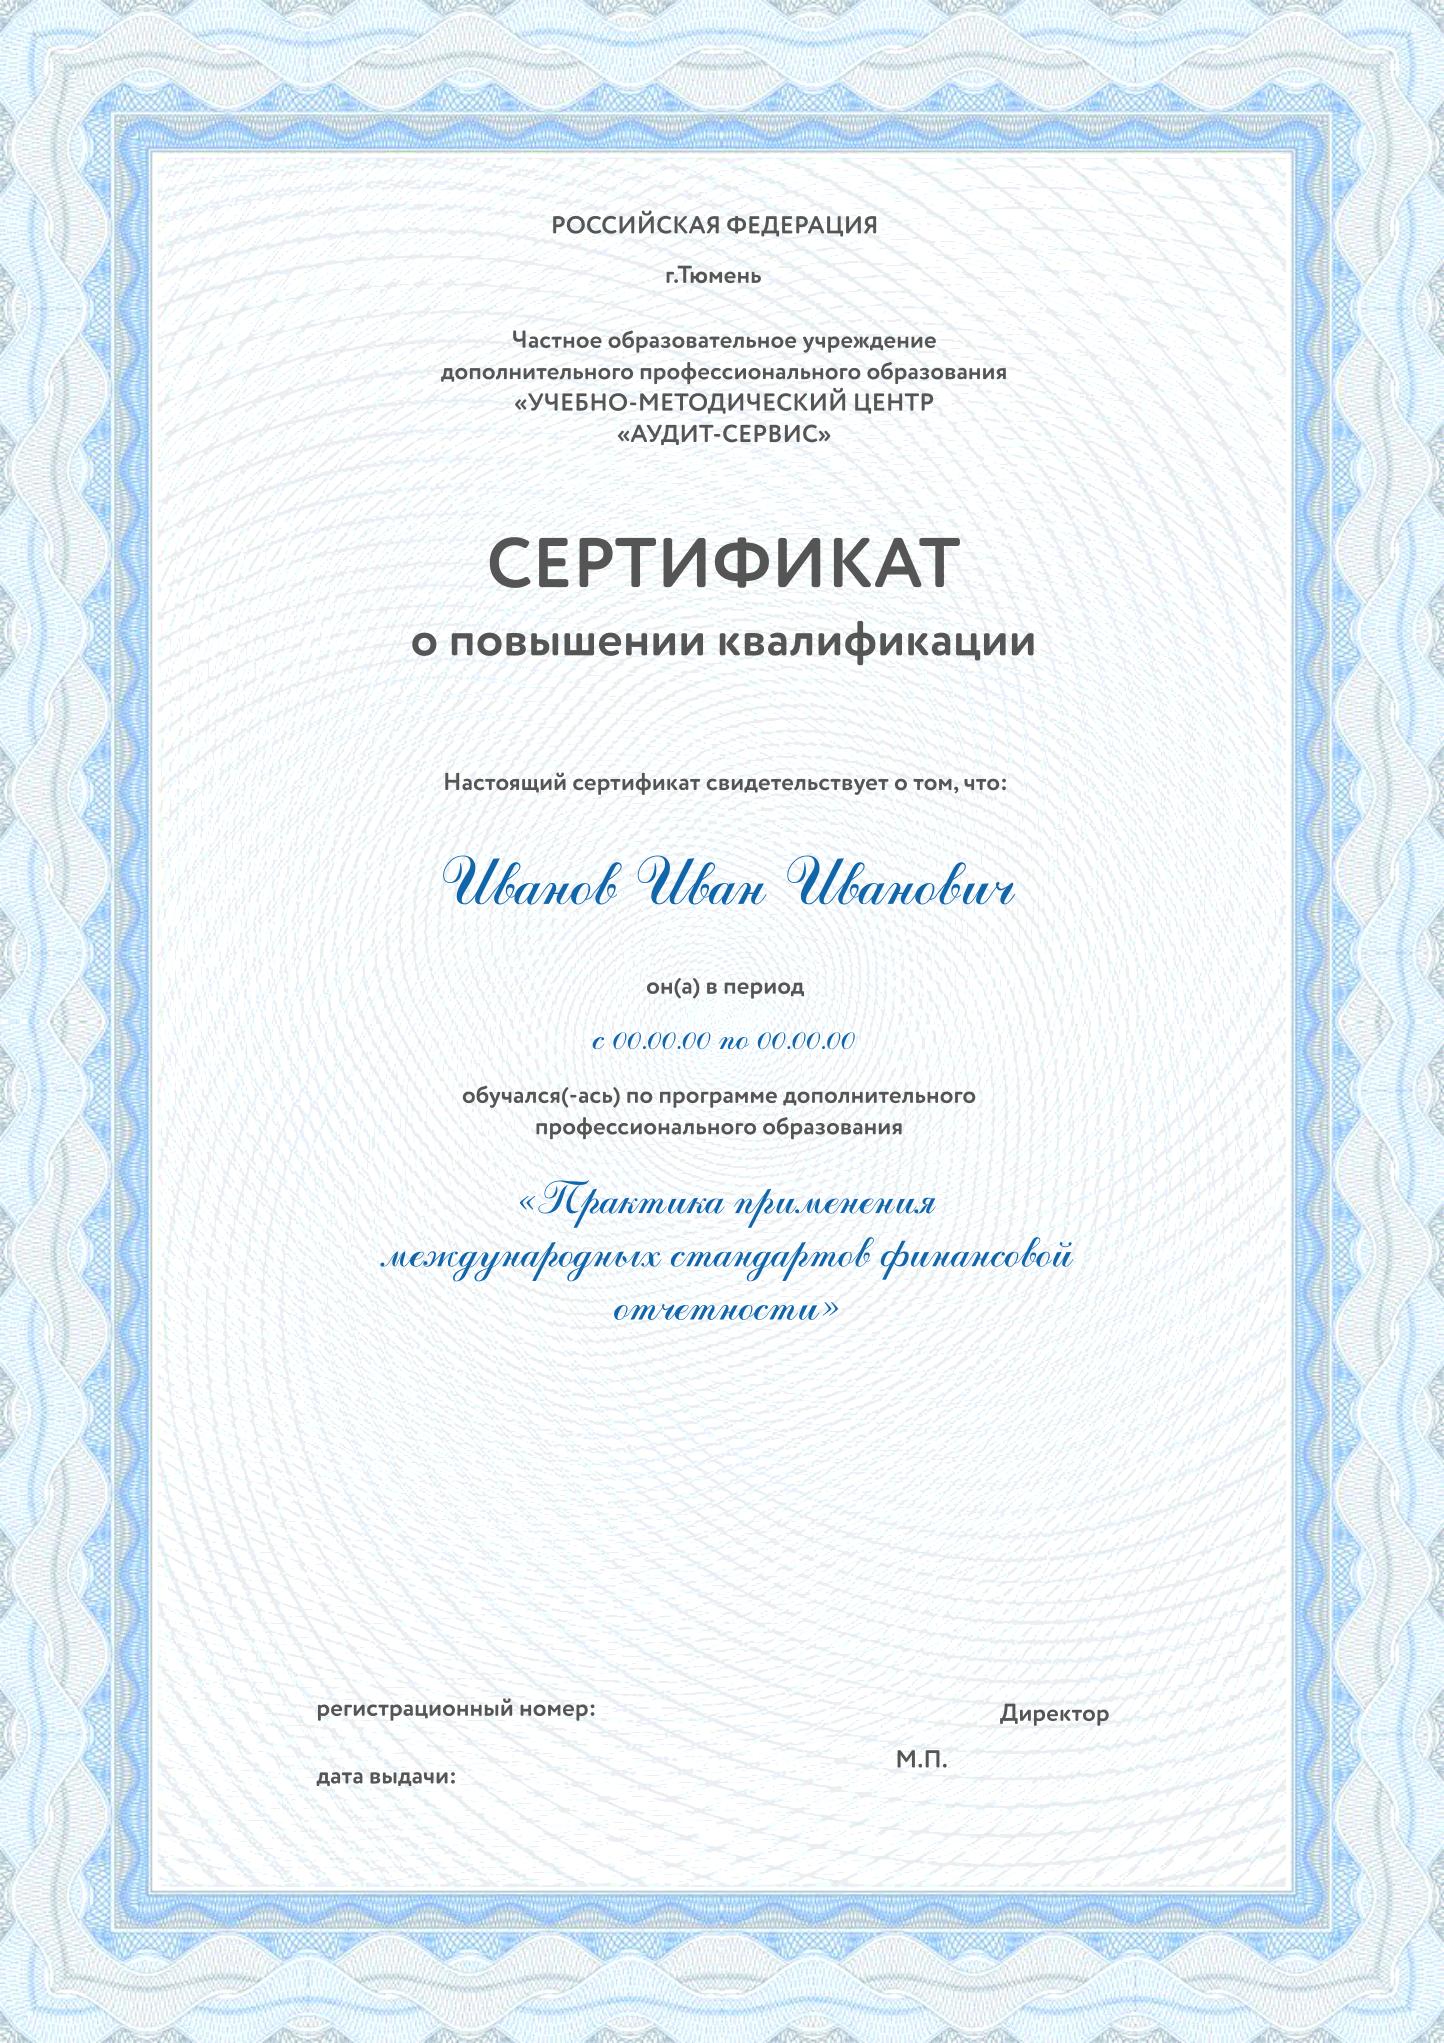 sertifikat_povyshenie_kvalifikacii